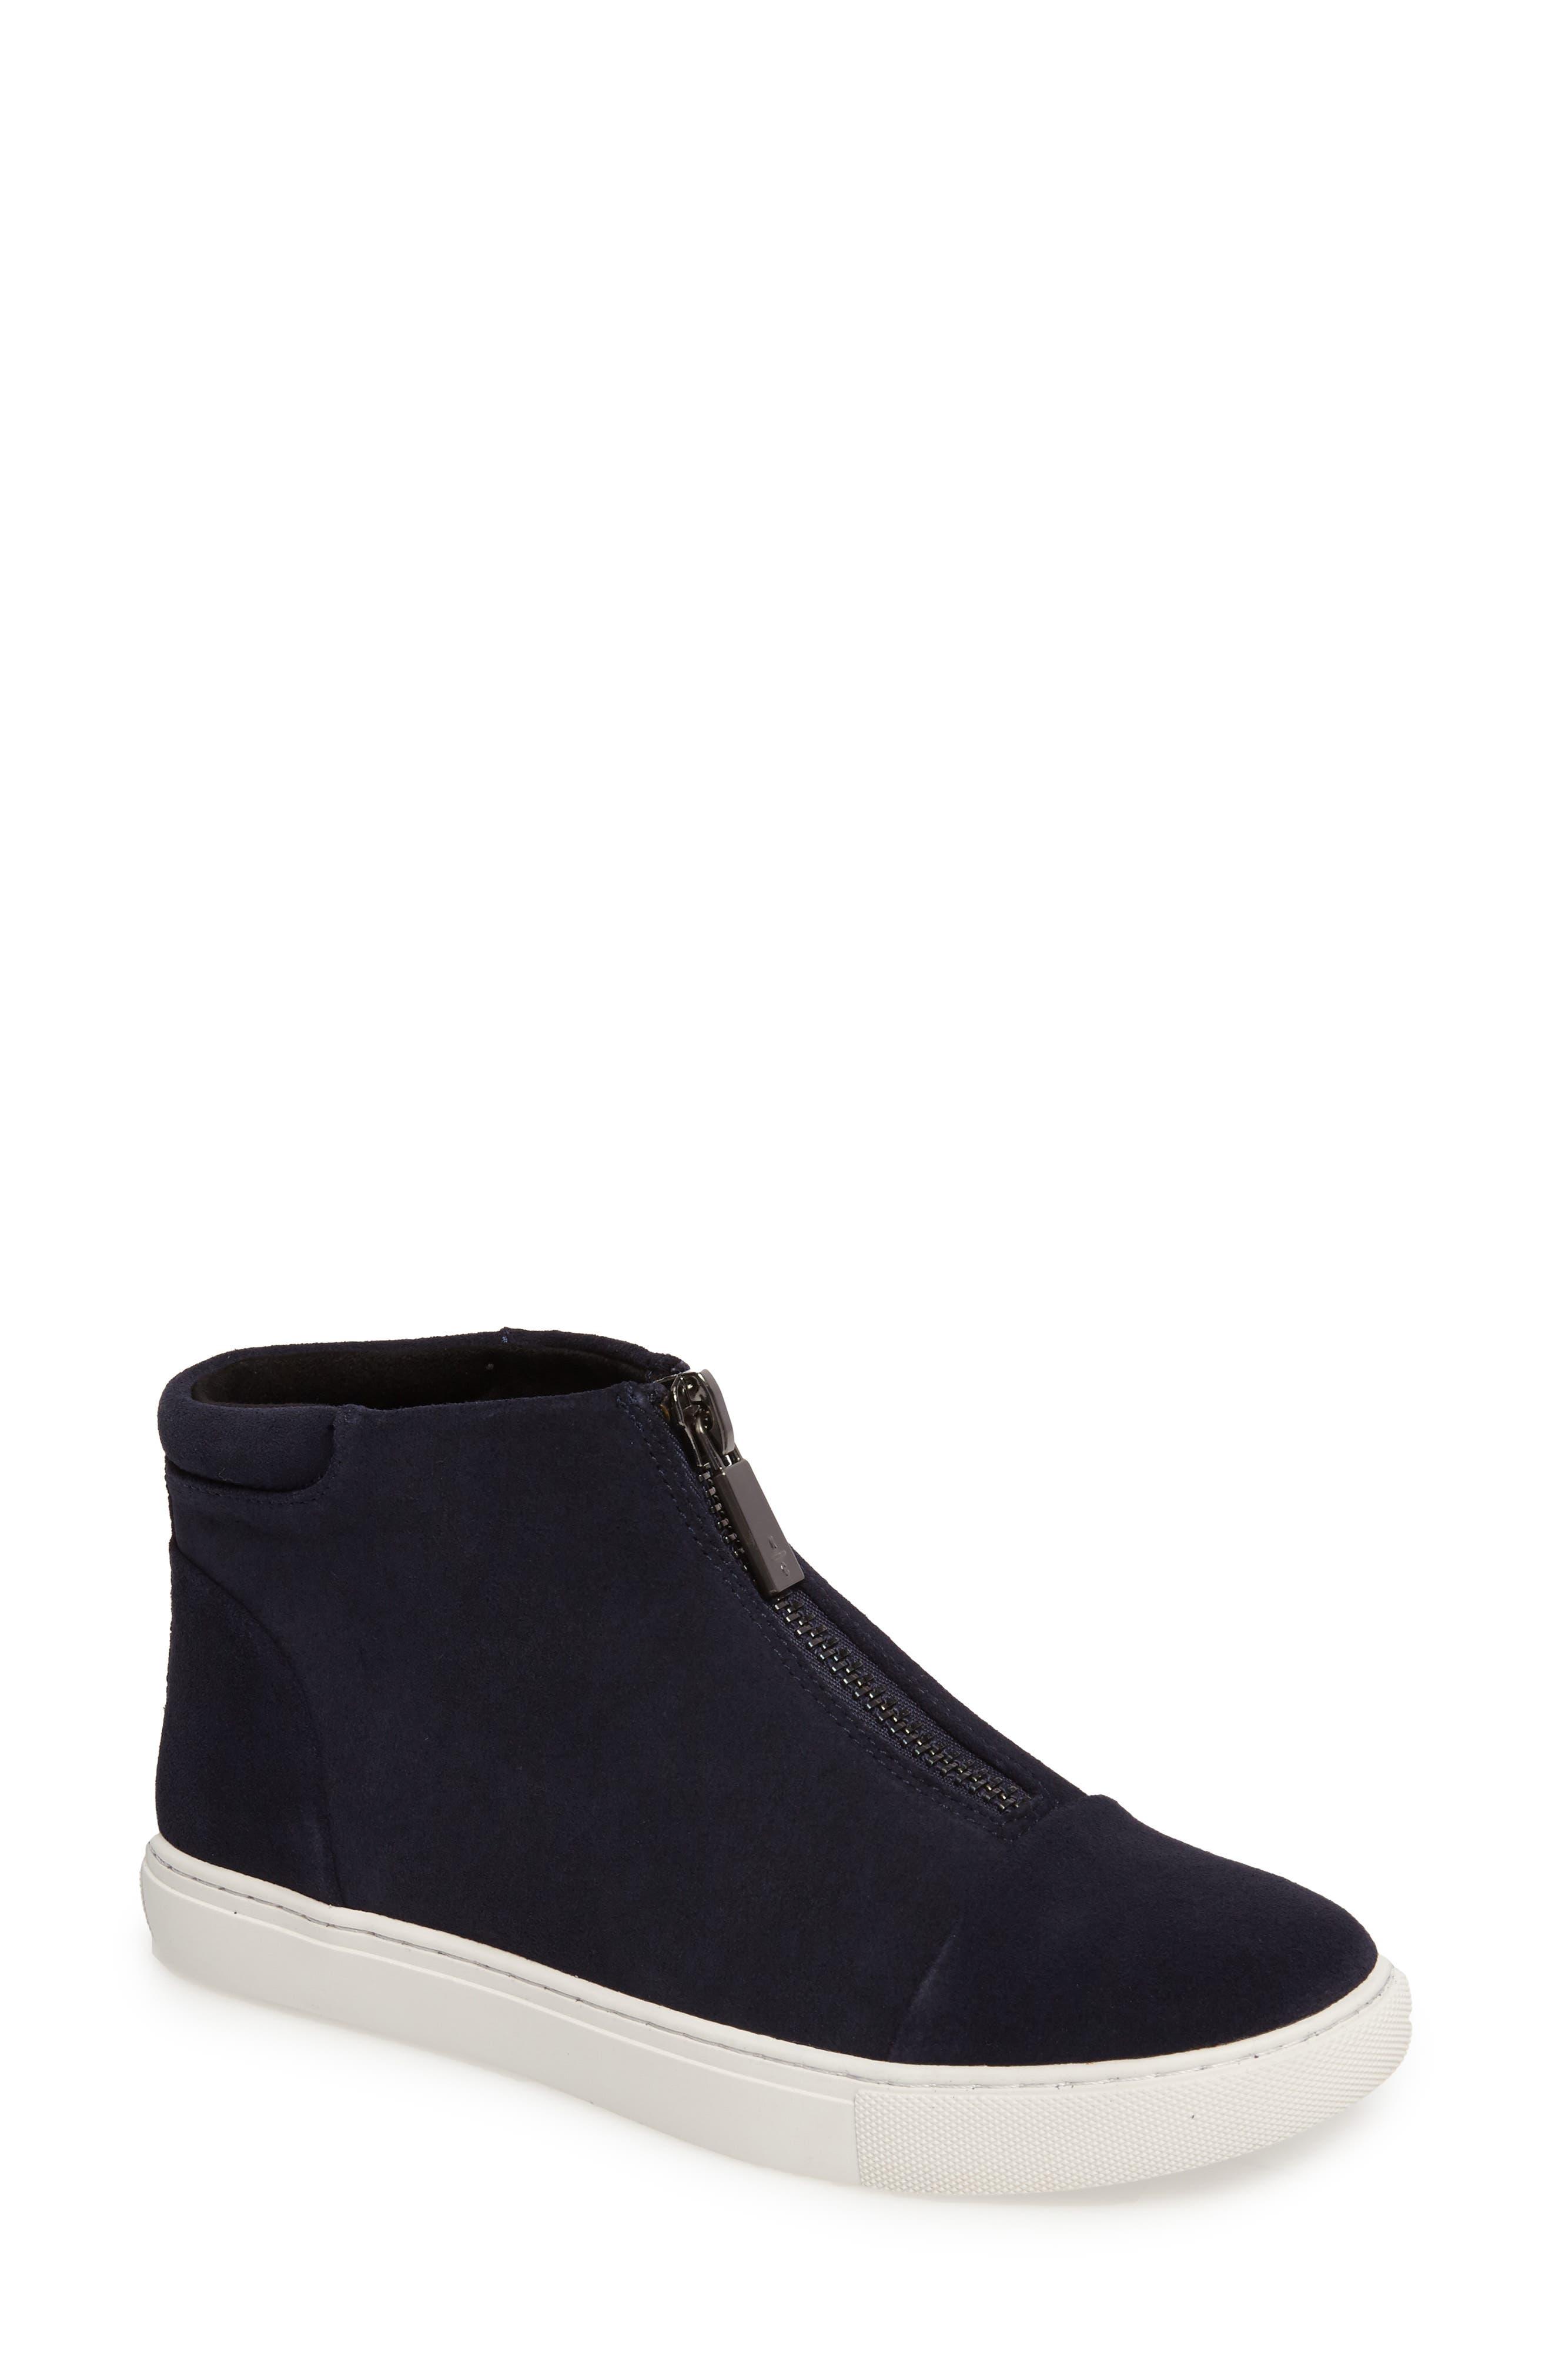 Alternate Image 1 Selected - Kenneth Cole New York Kayla Zip Sneaker (Women)